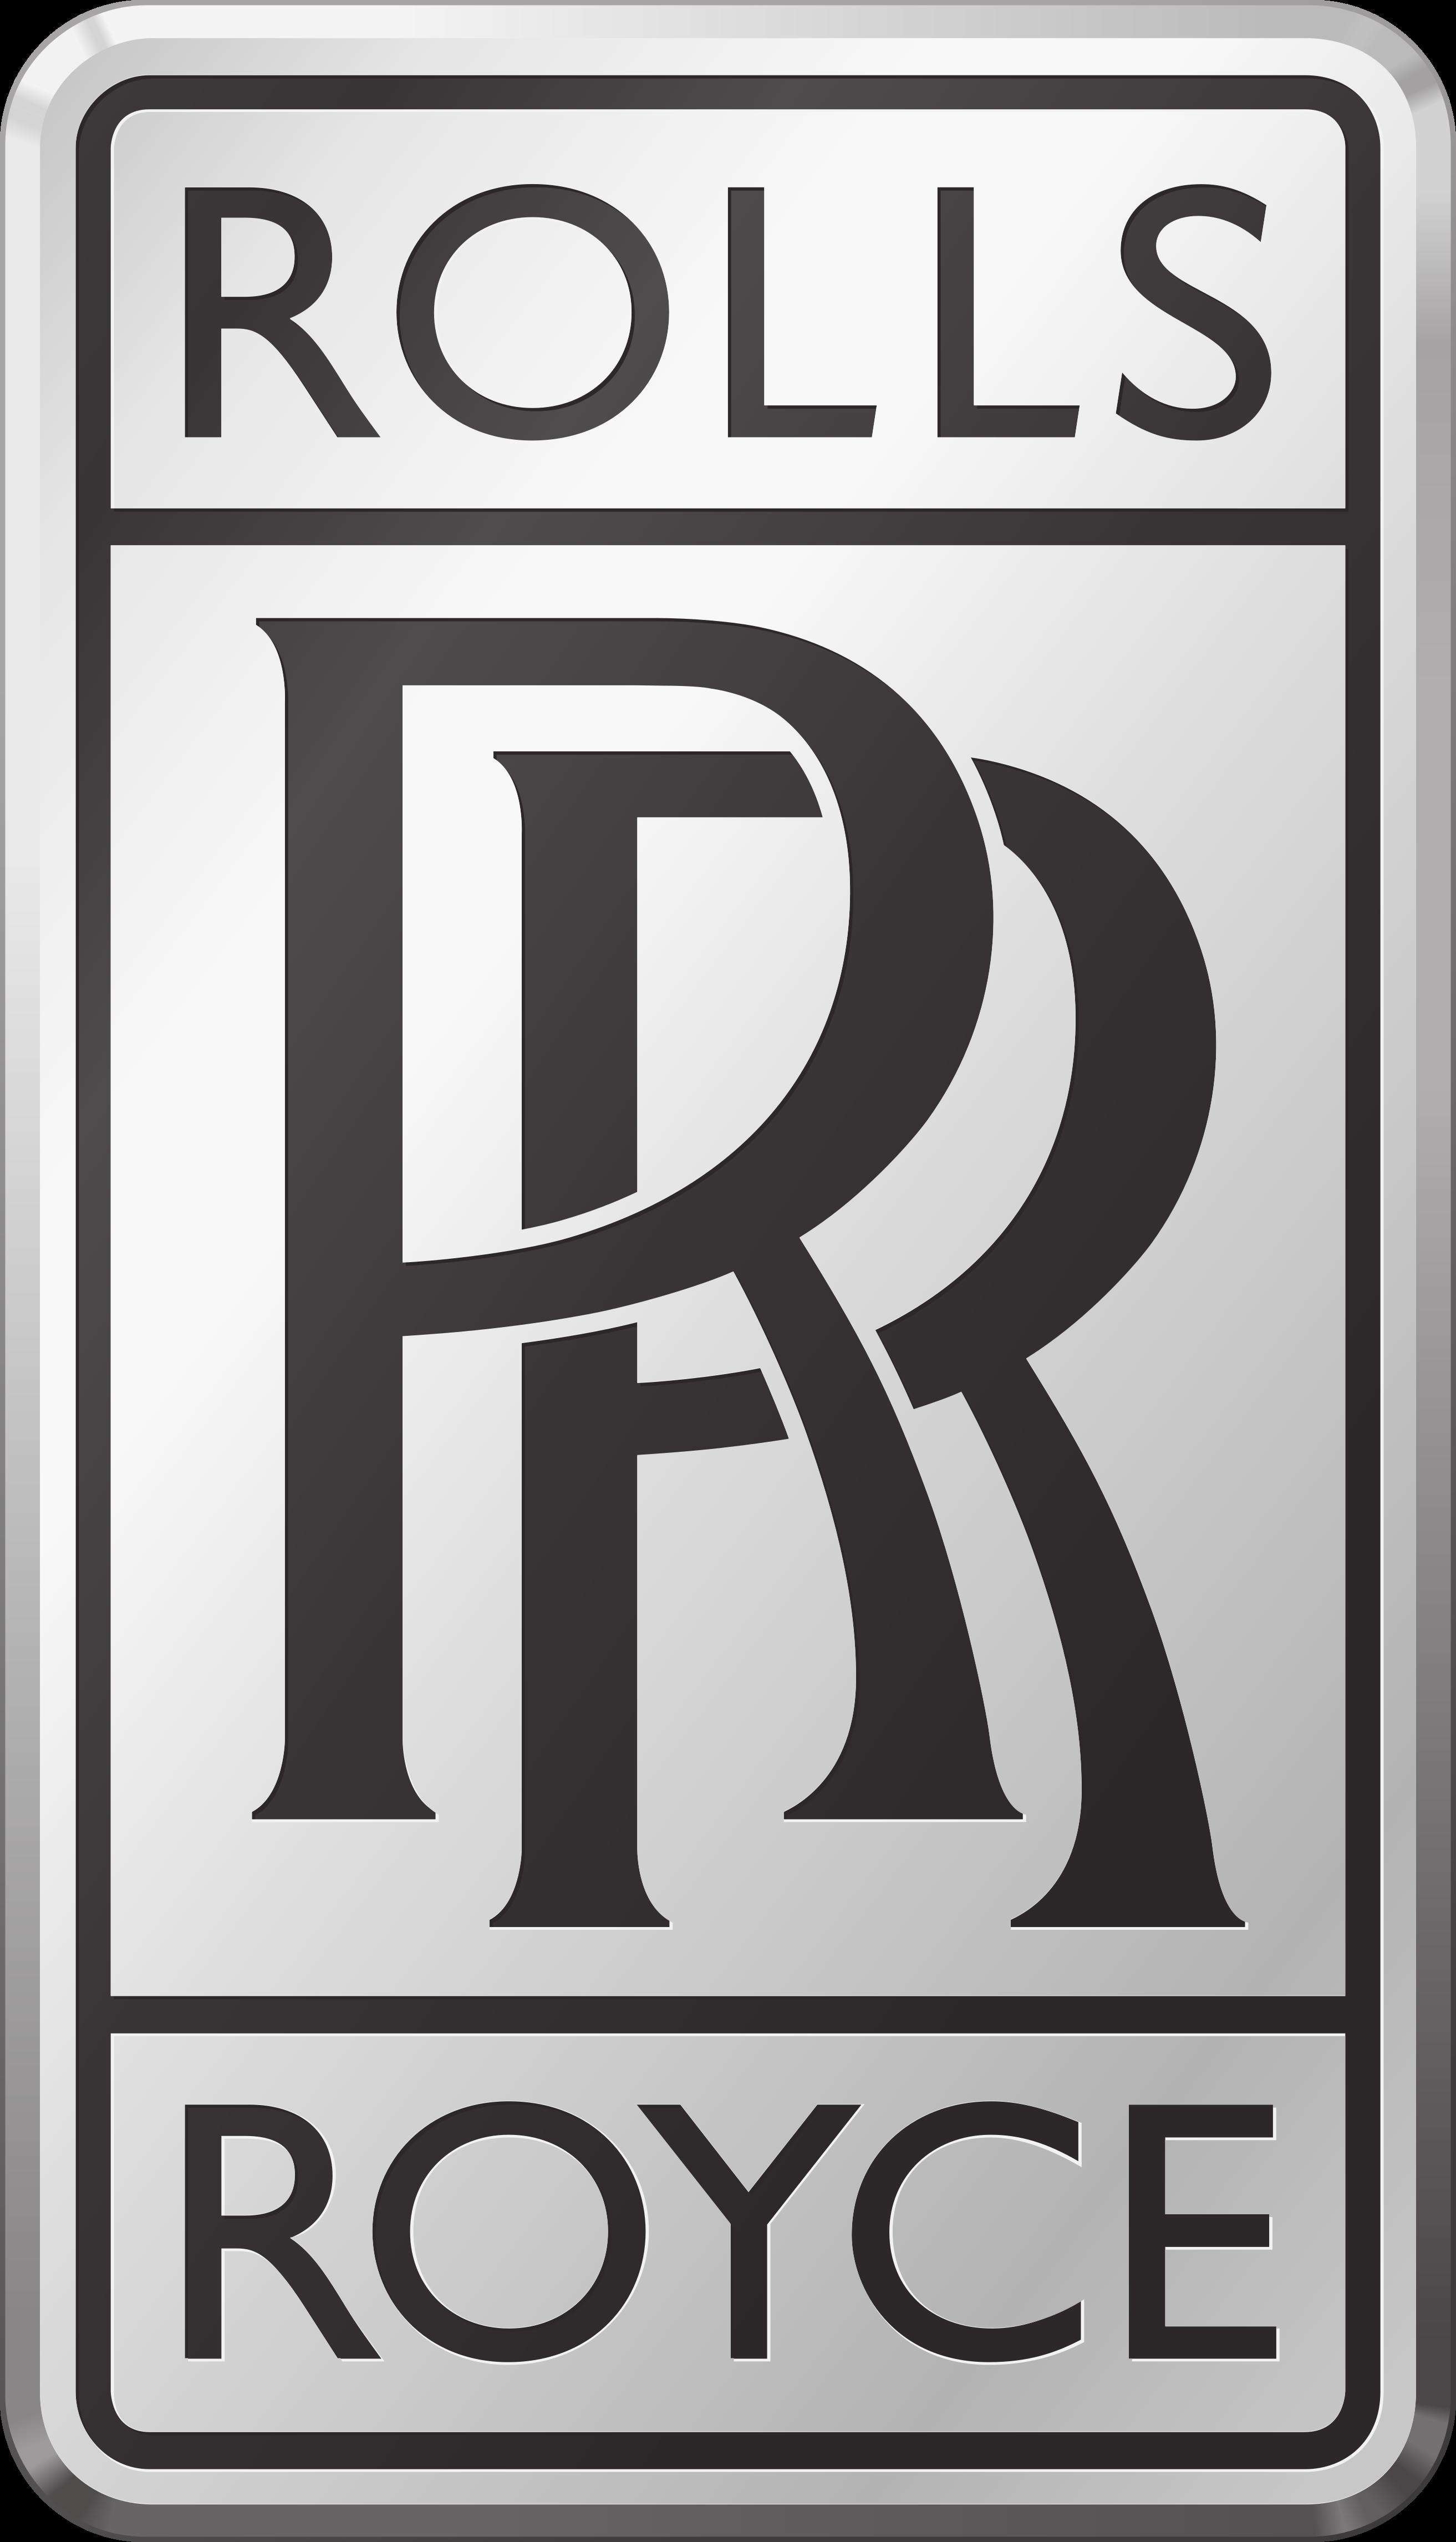 Rolls Royce America